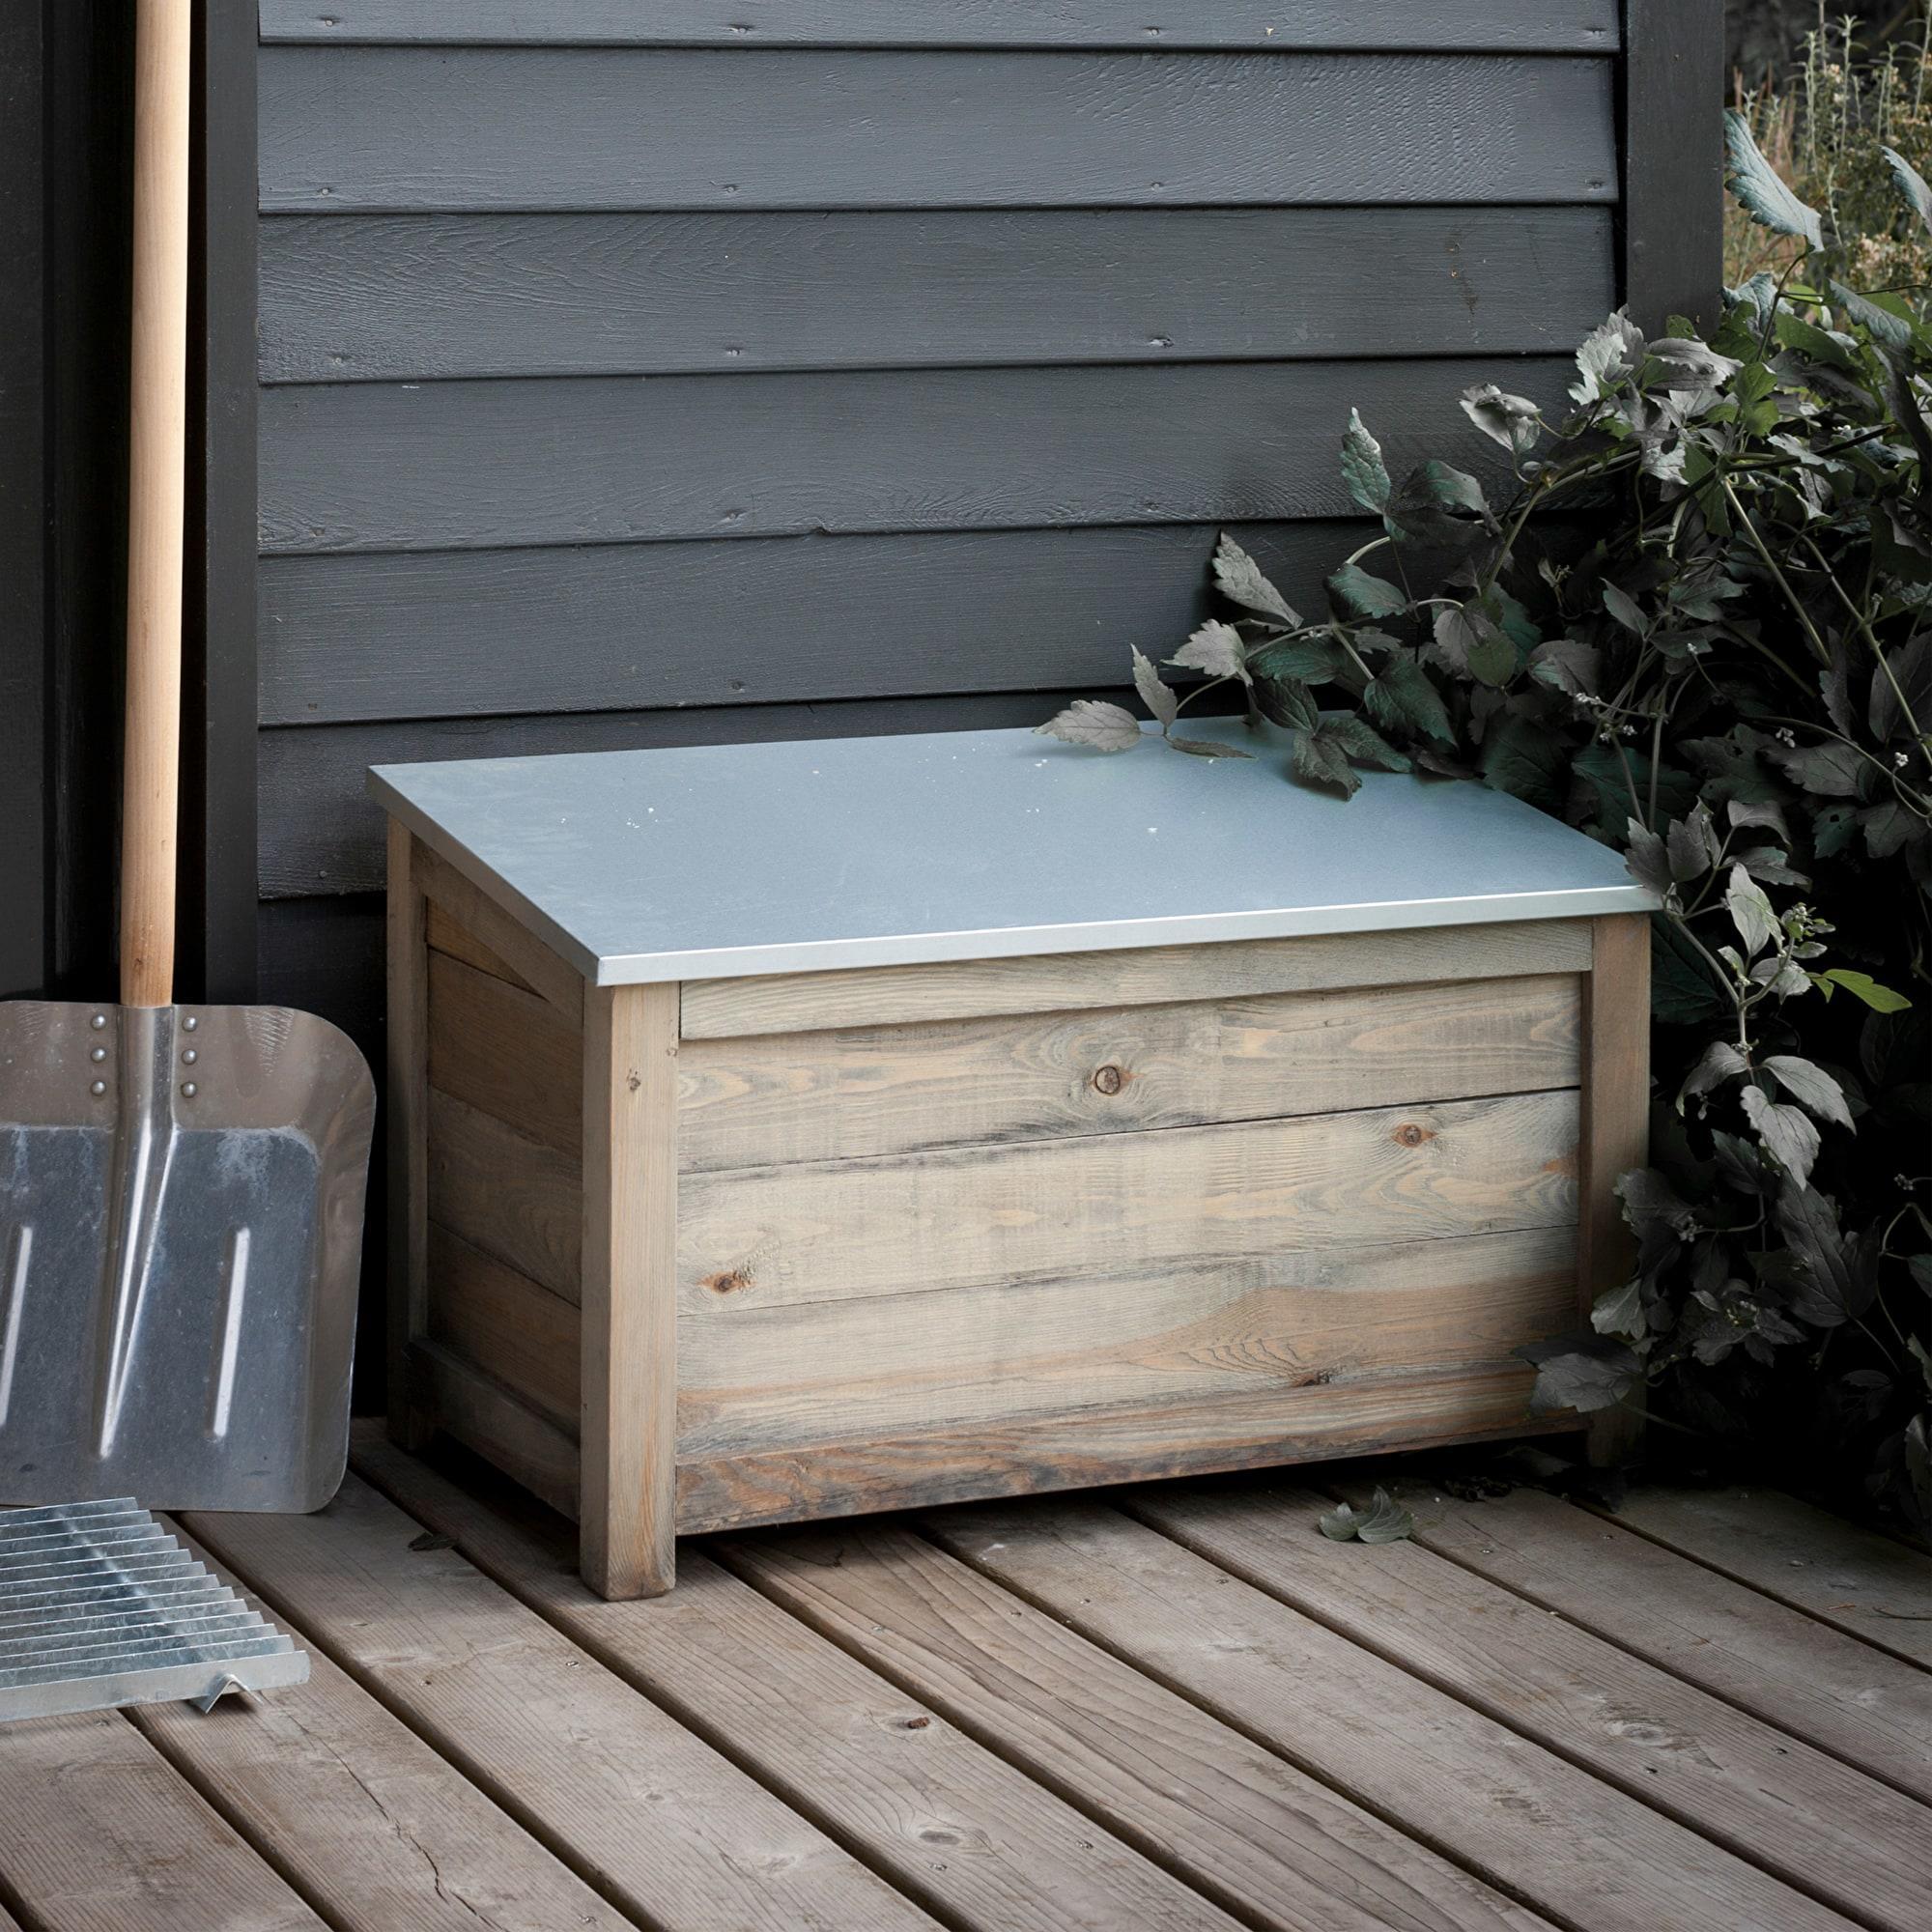 outdoor_storage_box_garden_wood_spruce_weatherproof ...